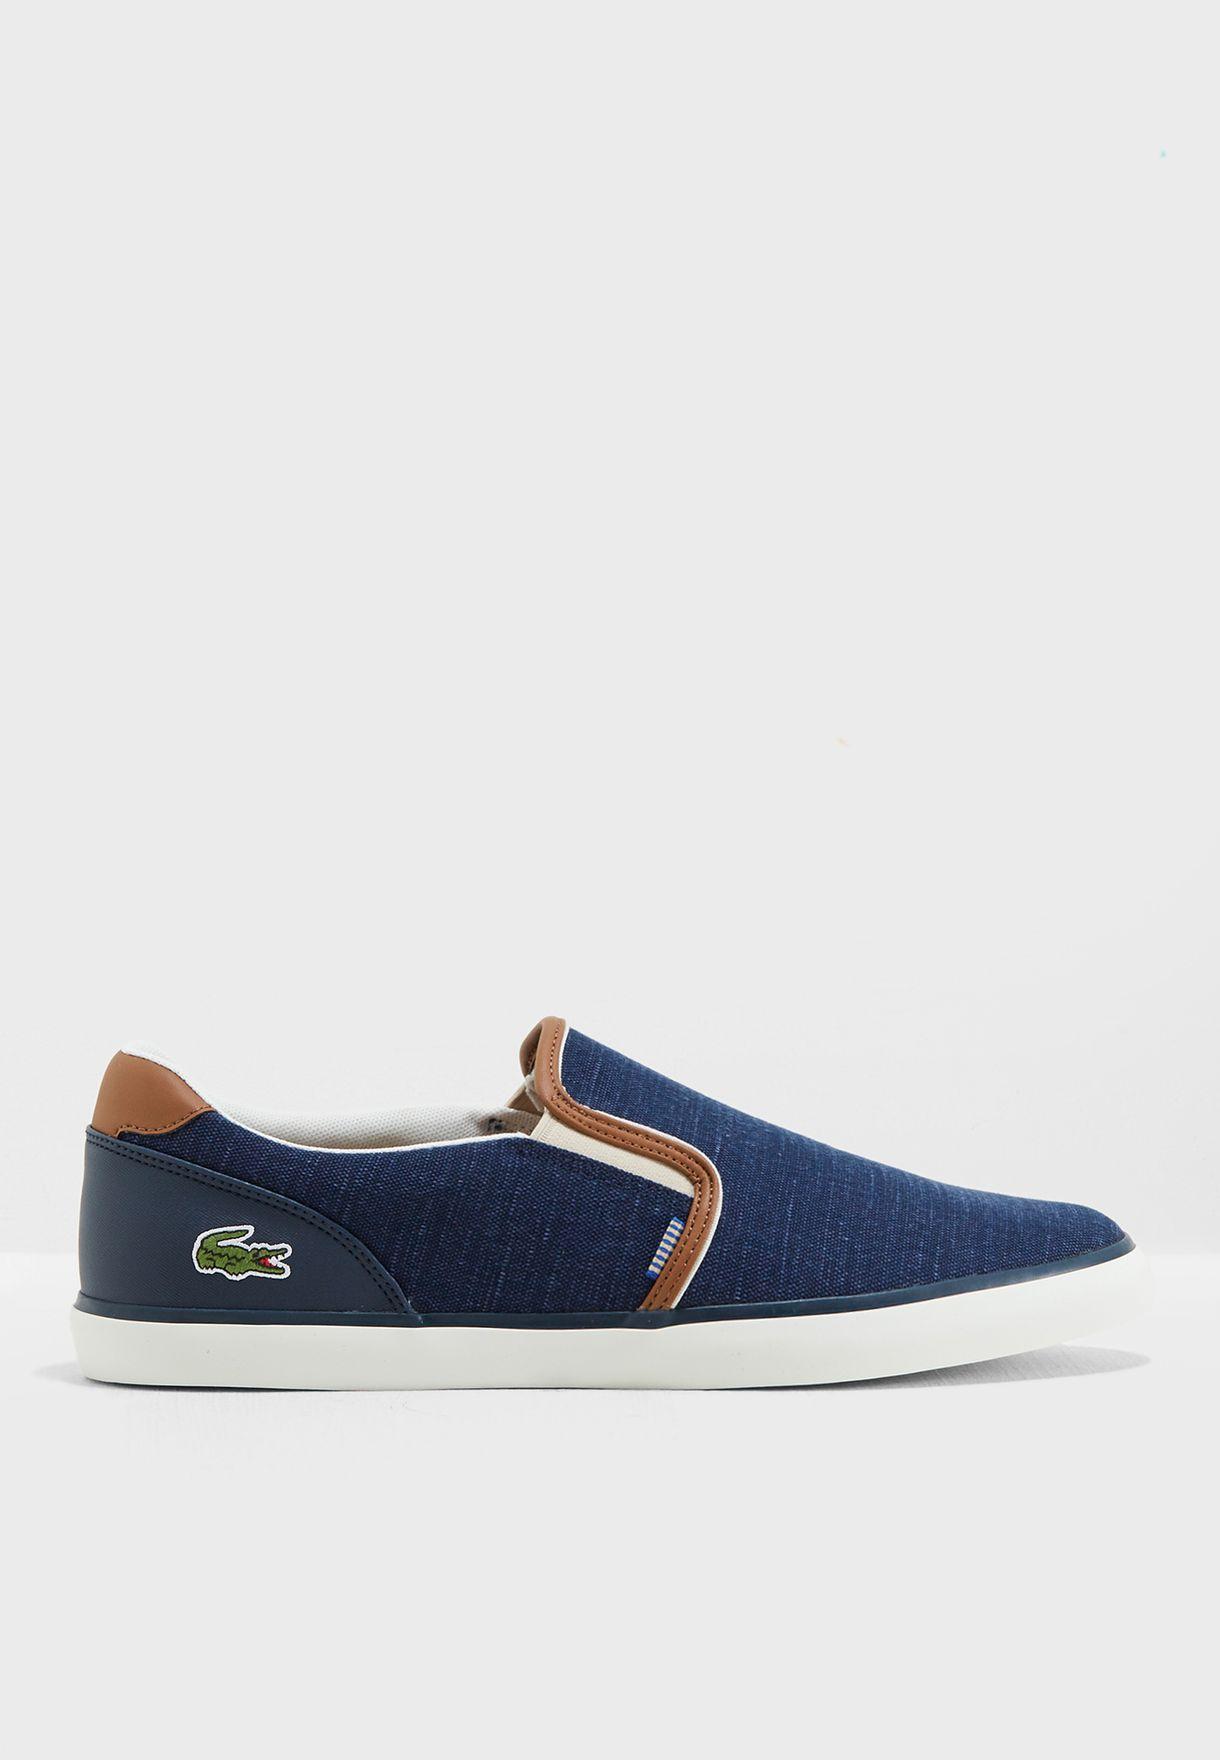 3ab57df0b تسوق حذاء جور ماركة لاكوست لون كحلي 36CAM0037NT1 في السعودية ...